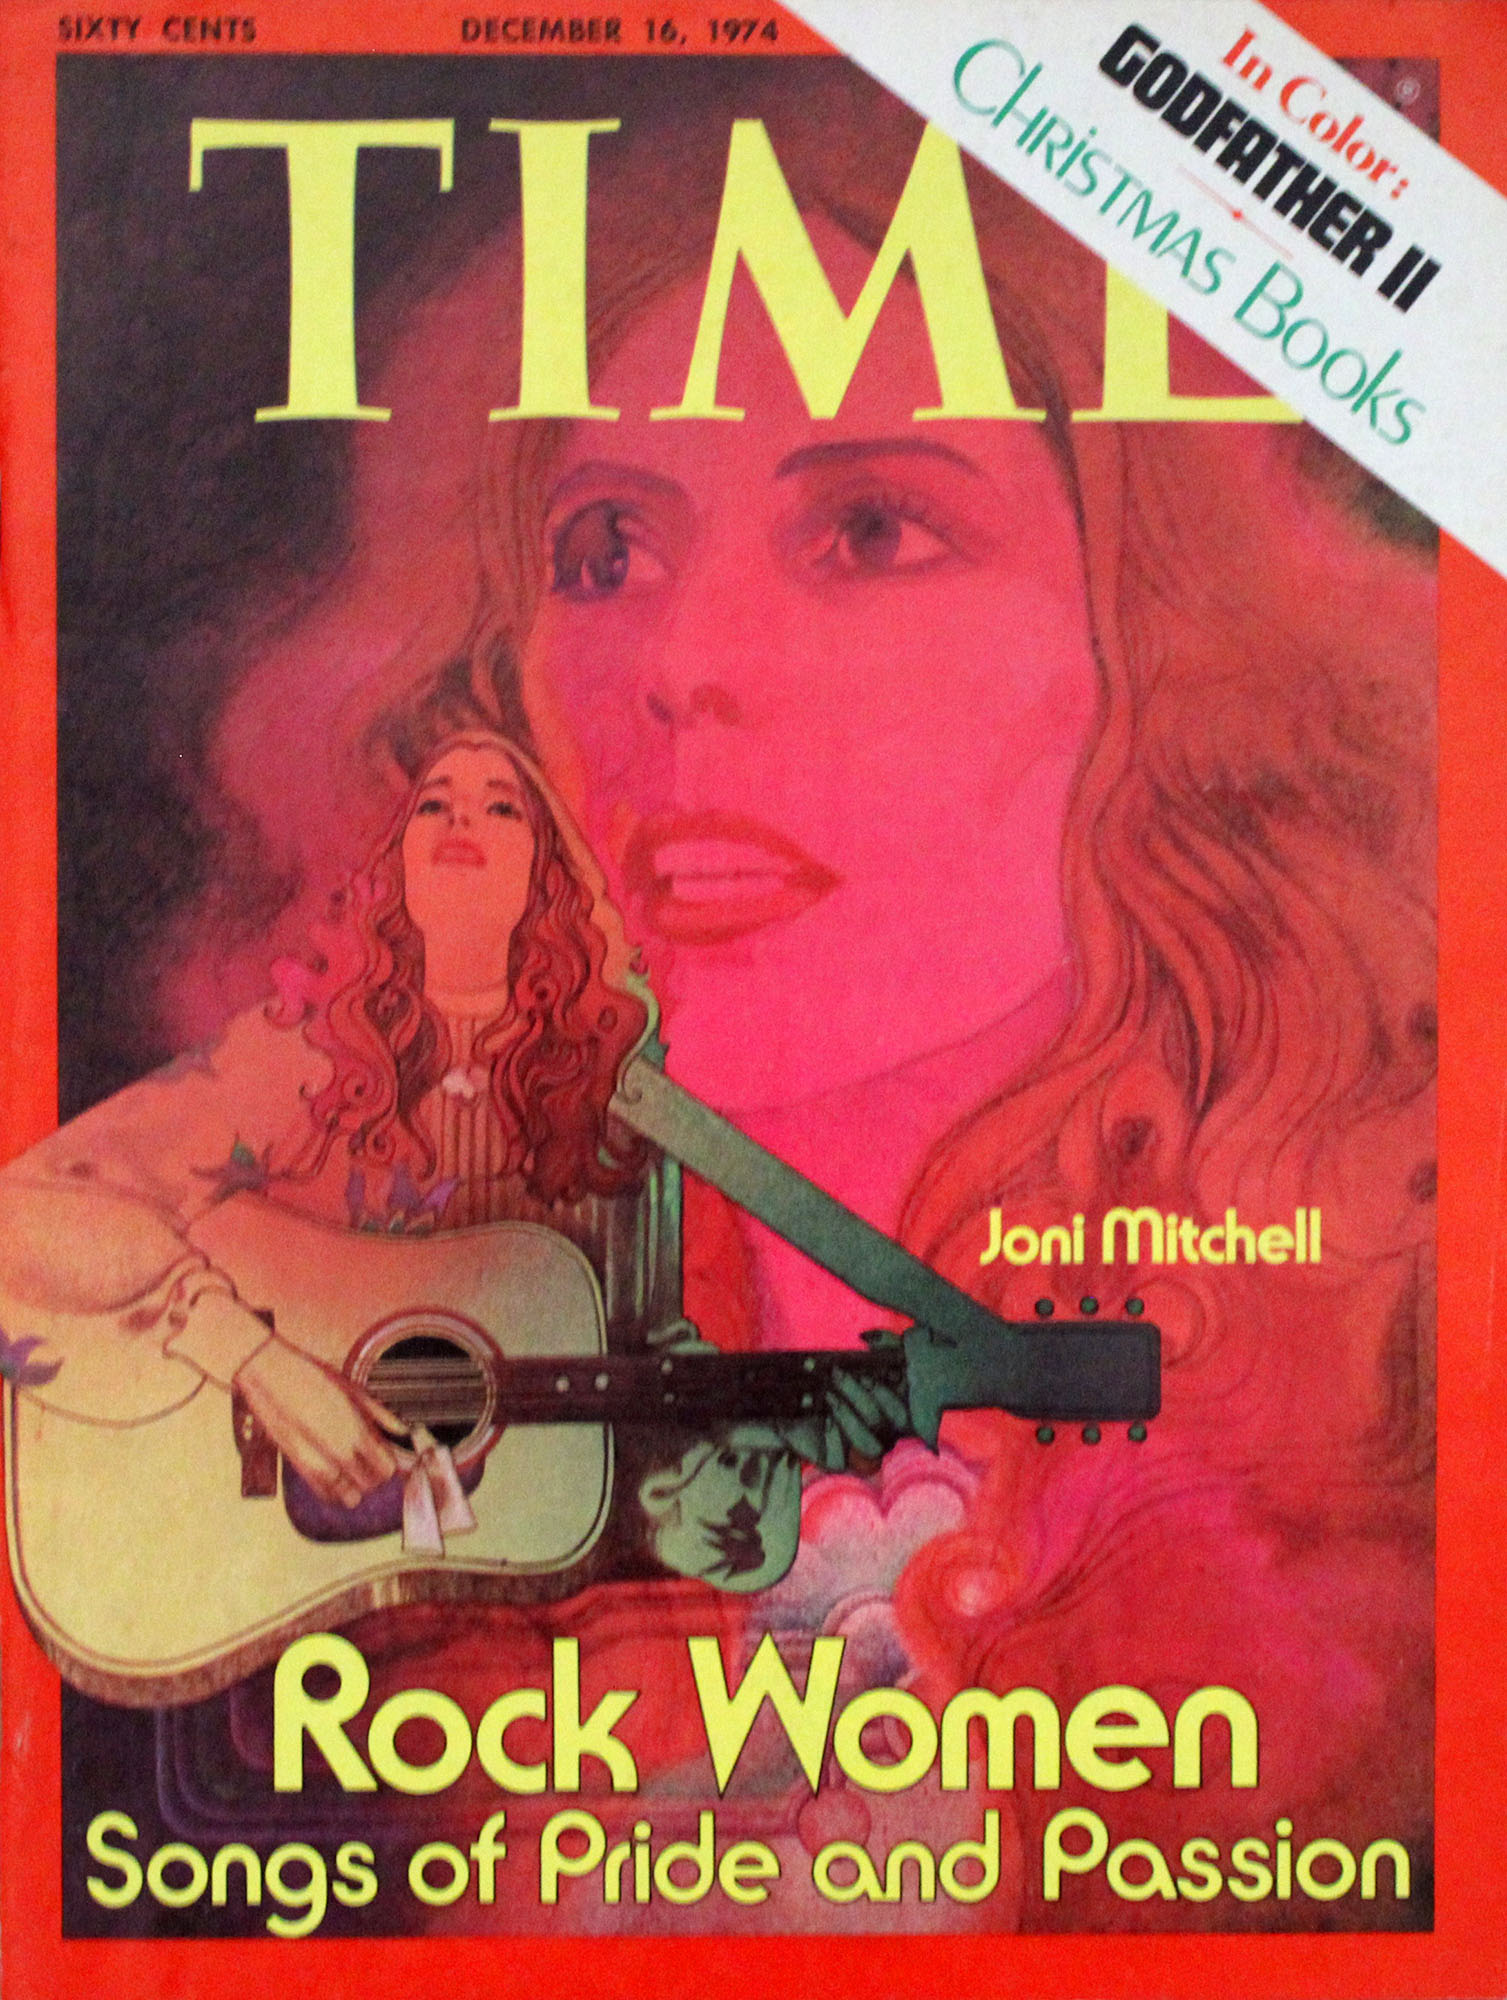 Time Vol. 104 No.25